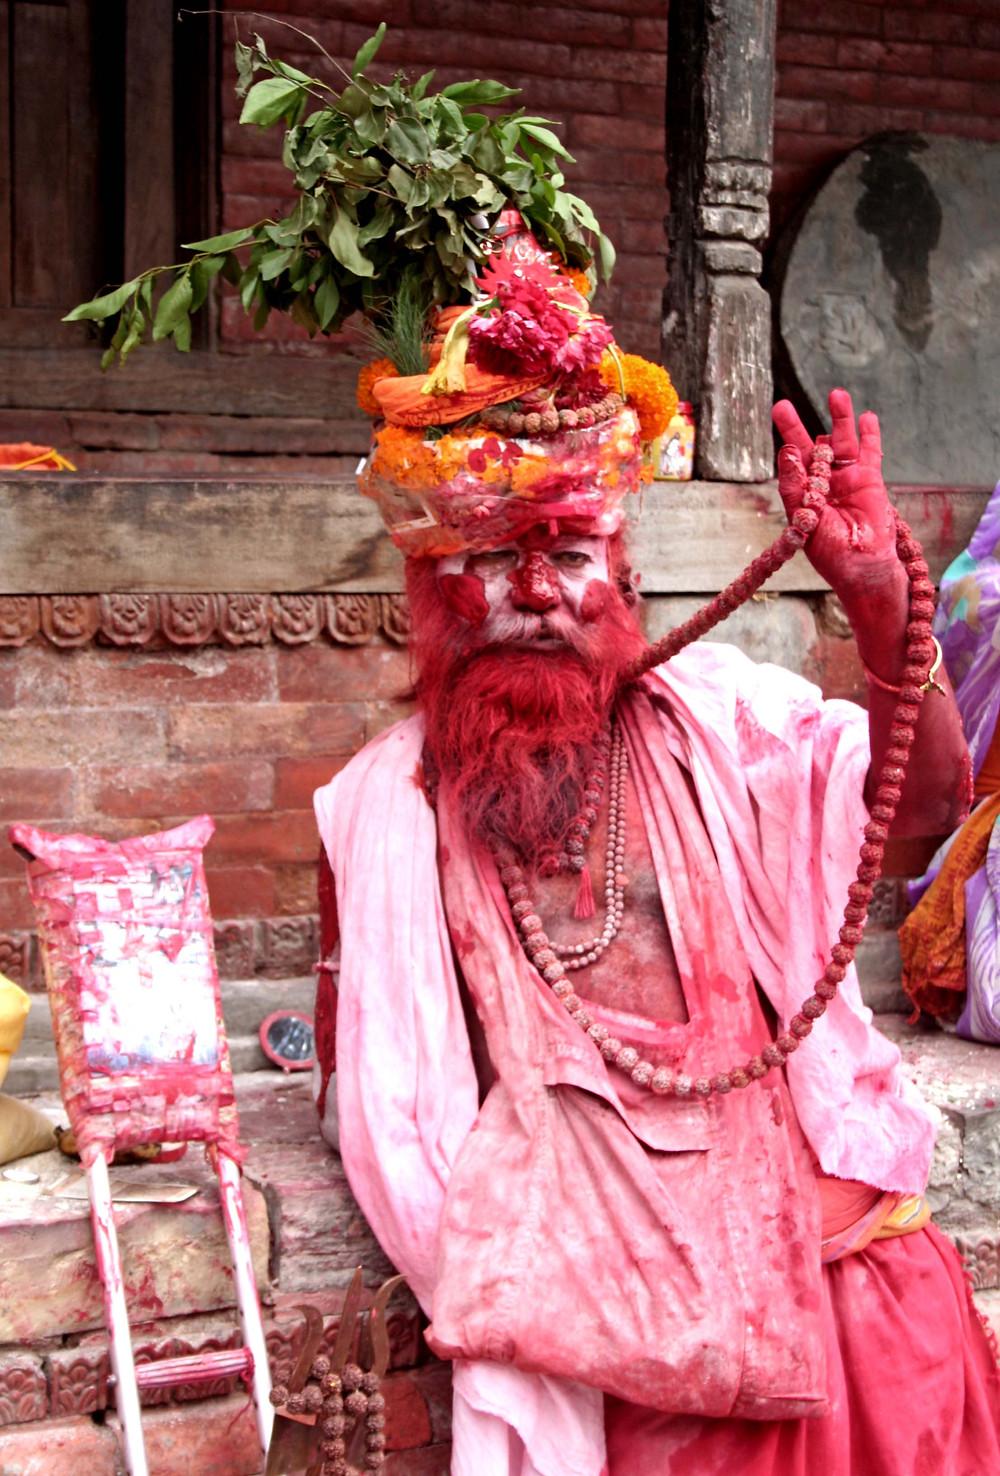 Sadhu (Pashupatinath – Nepal, agosto 2019)